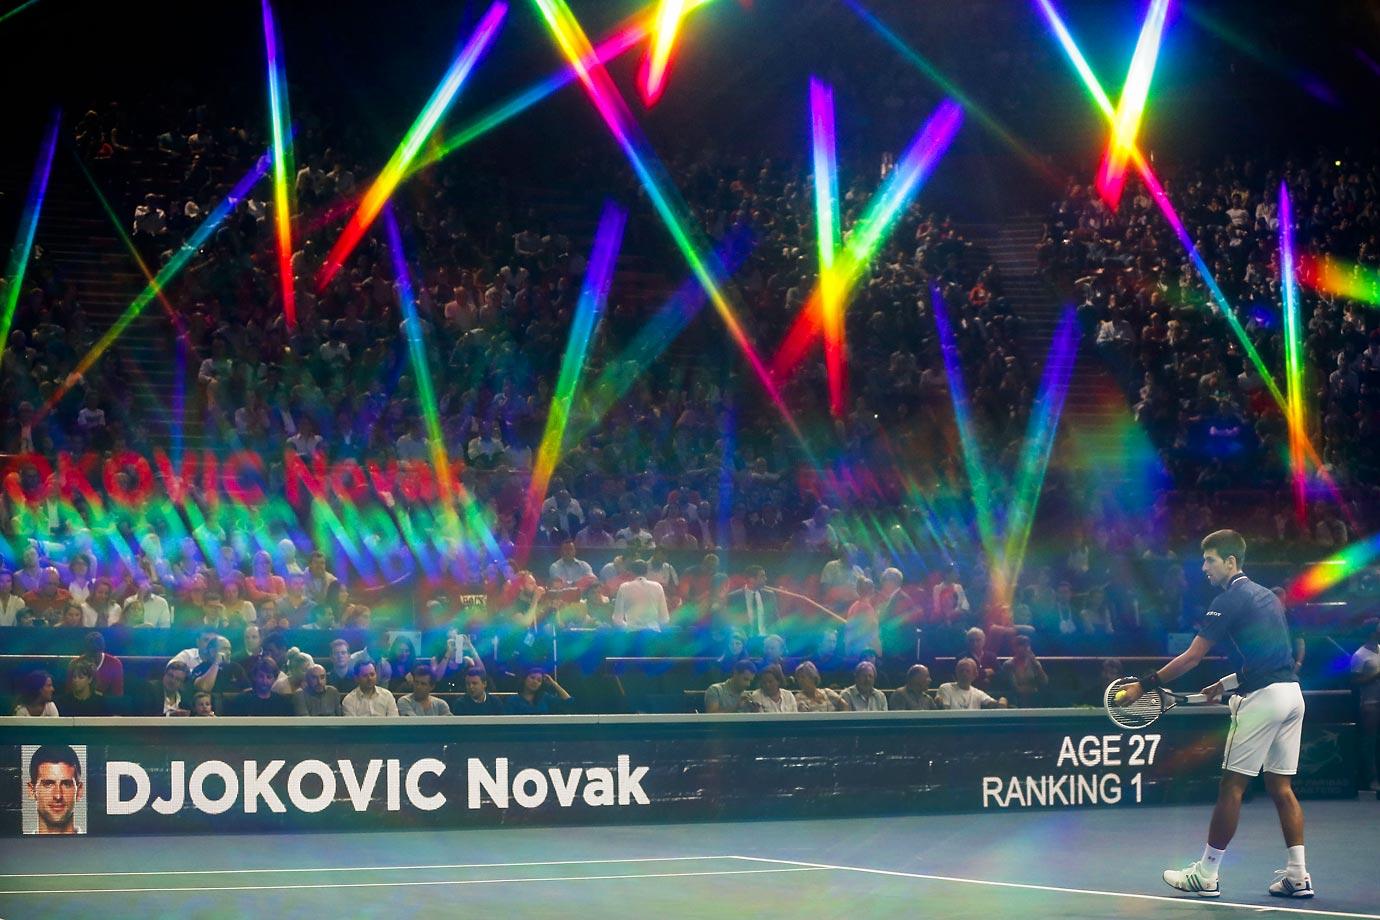 Crazy light effects surround Novak Djokovic during the BNP Paribas Masters Indoor 2014 in Paris.